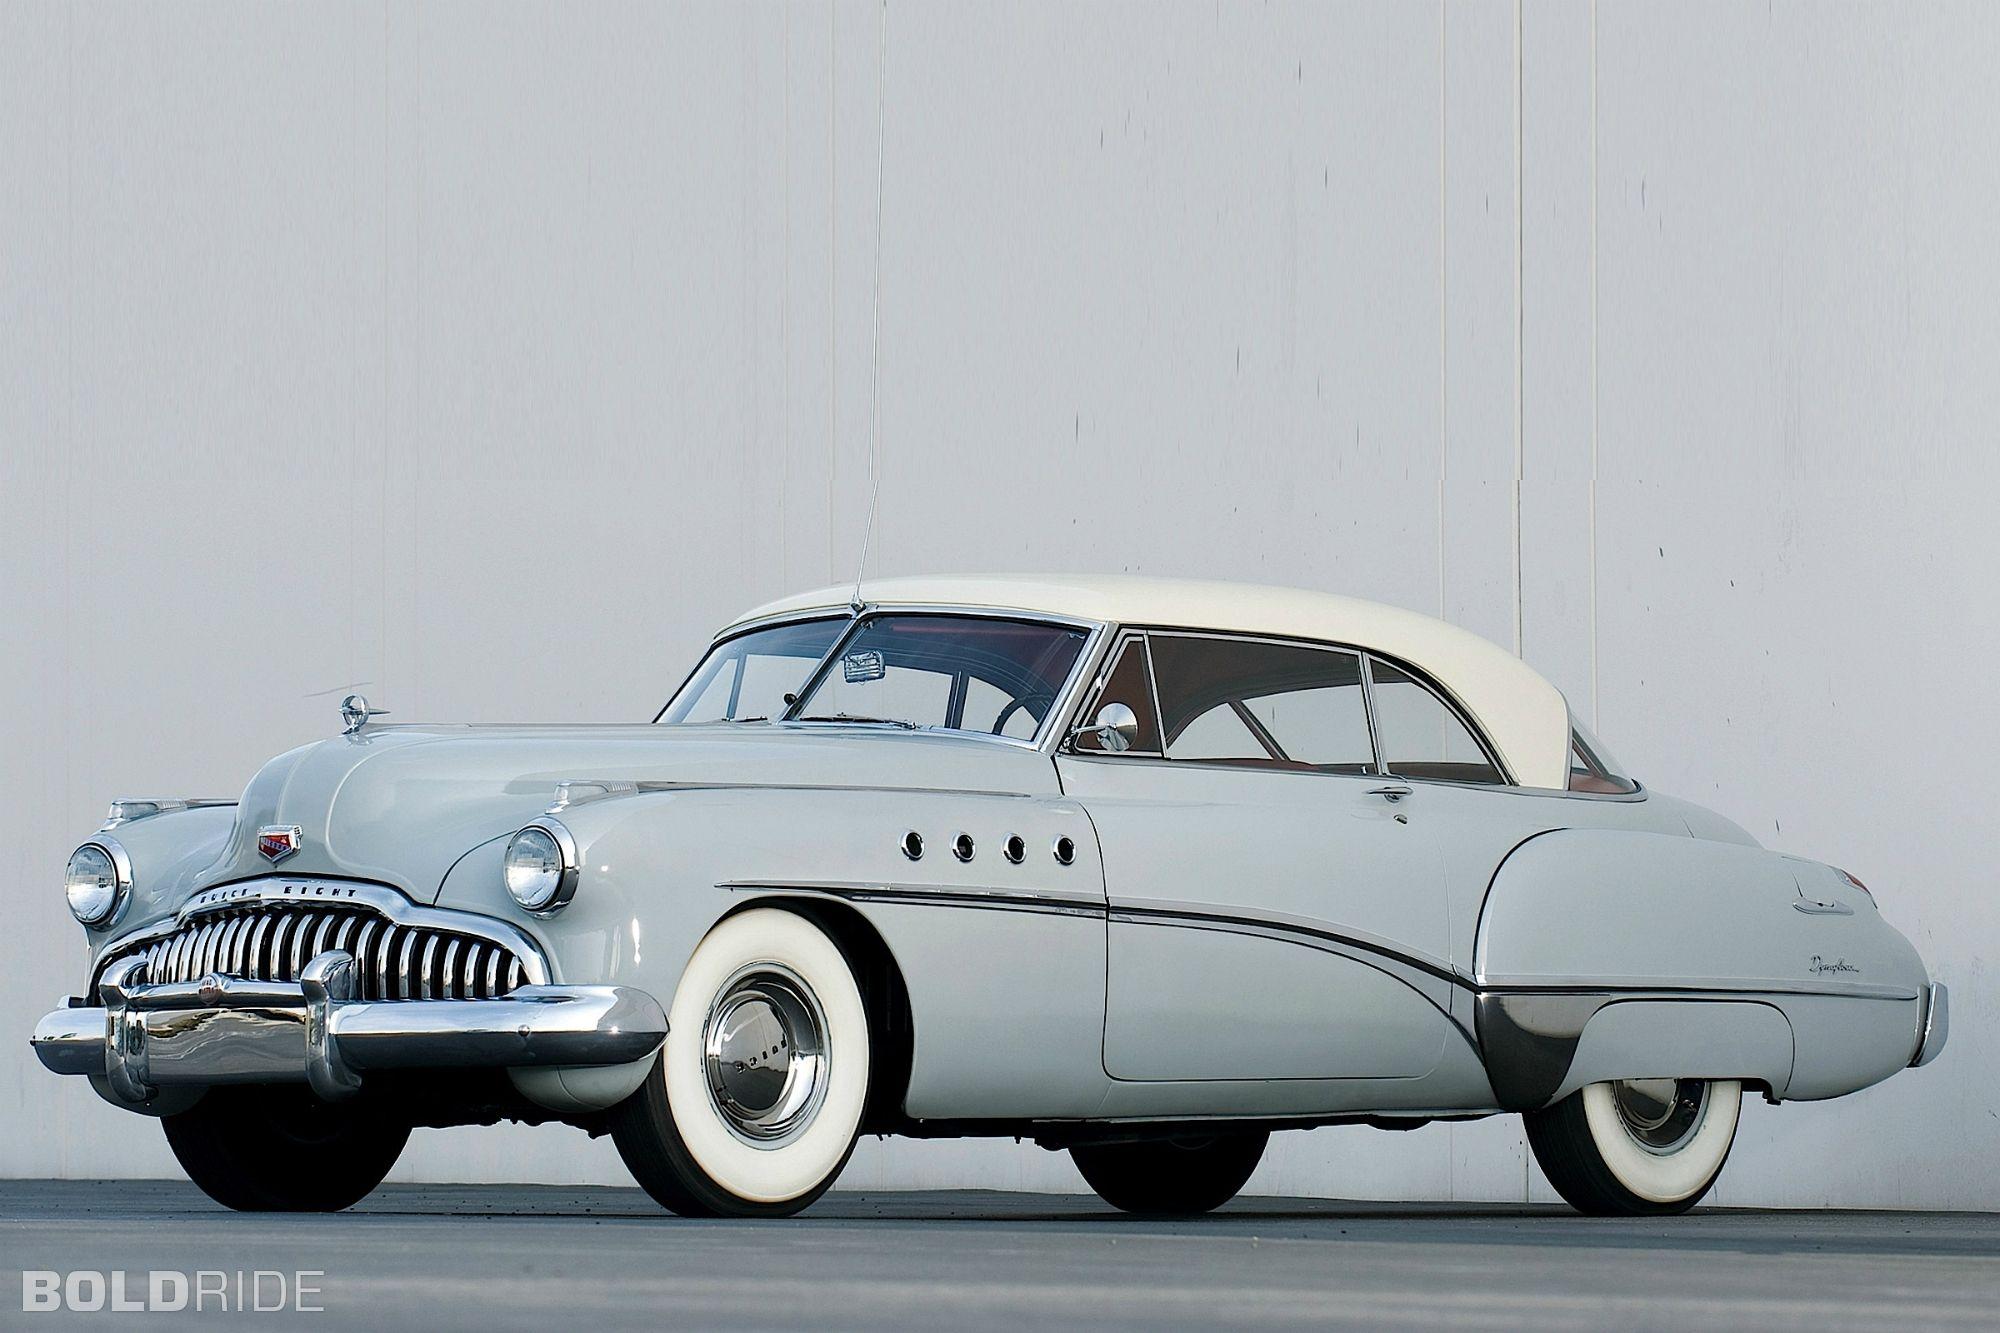 Https Www Google Com Search Q 1949 Buick Roadmaster